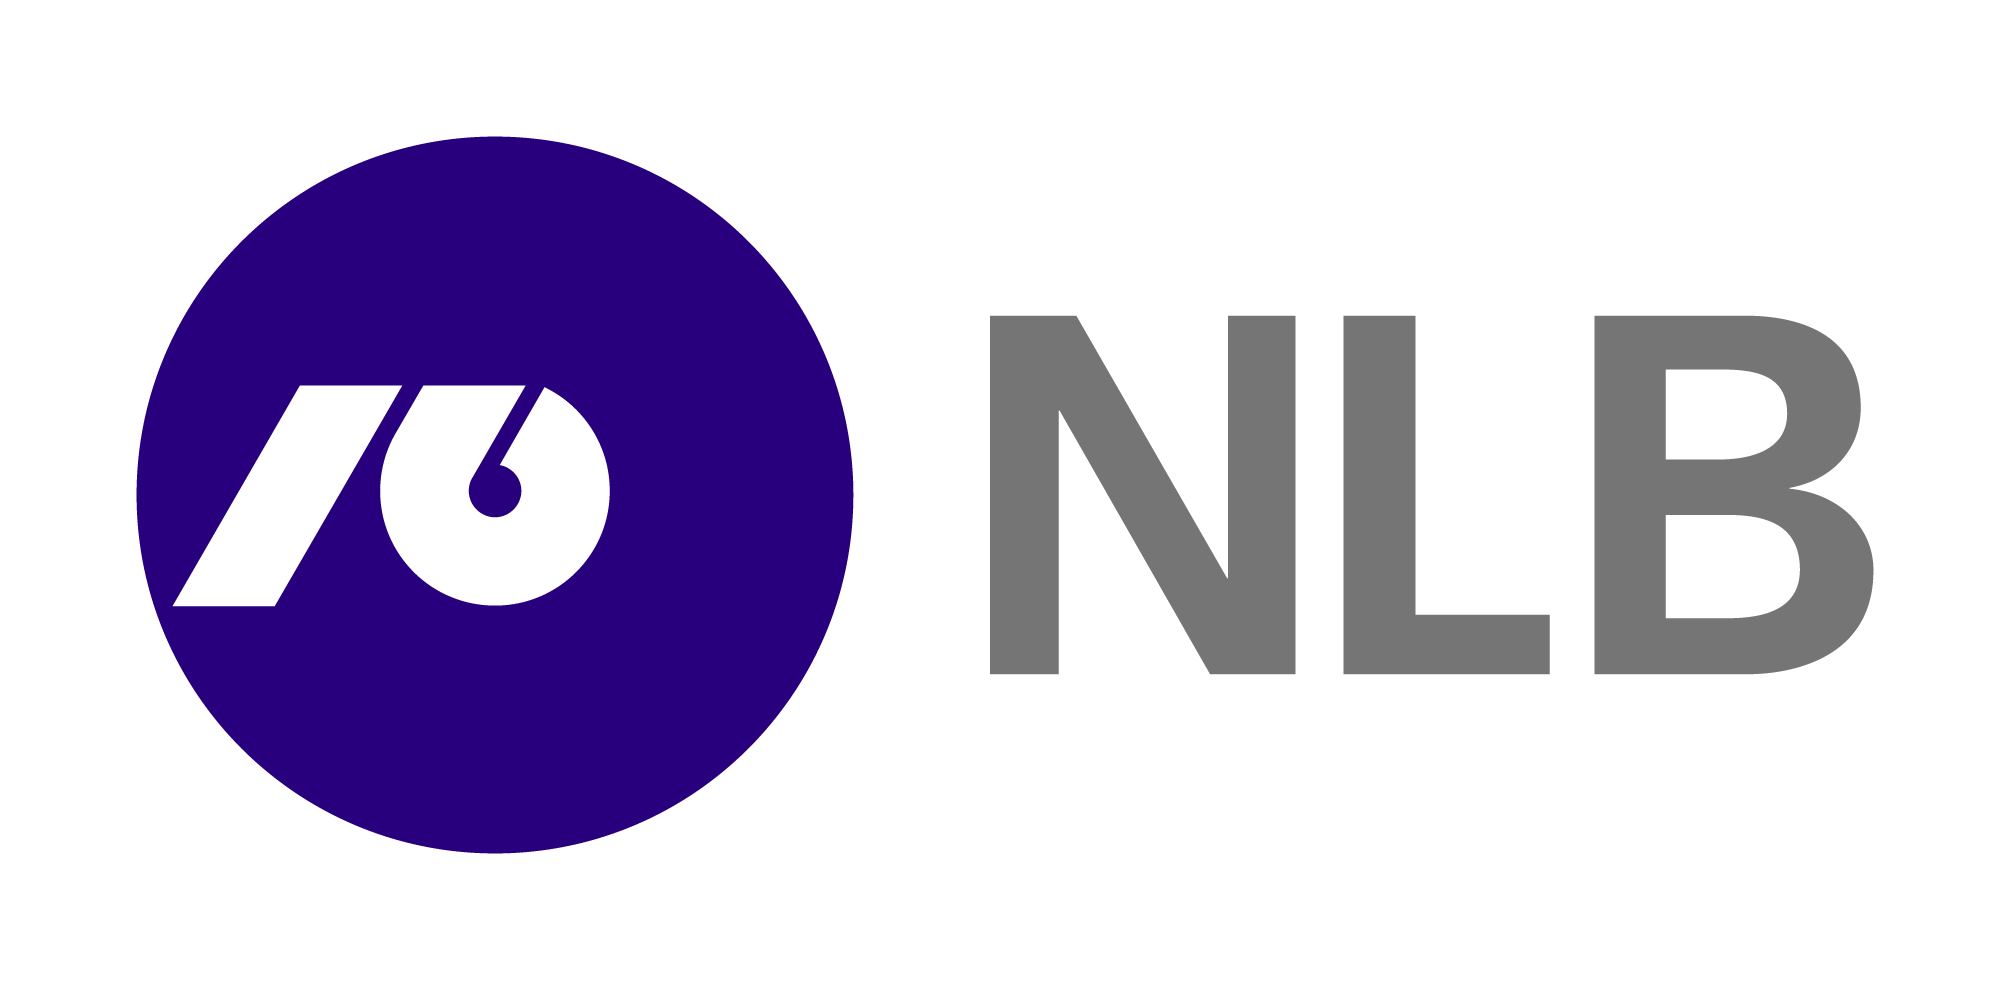 https://nkposavjekrsko.com/wp-content/uploads/2021/02/Logo_NLB_sponzorski_RGB.png